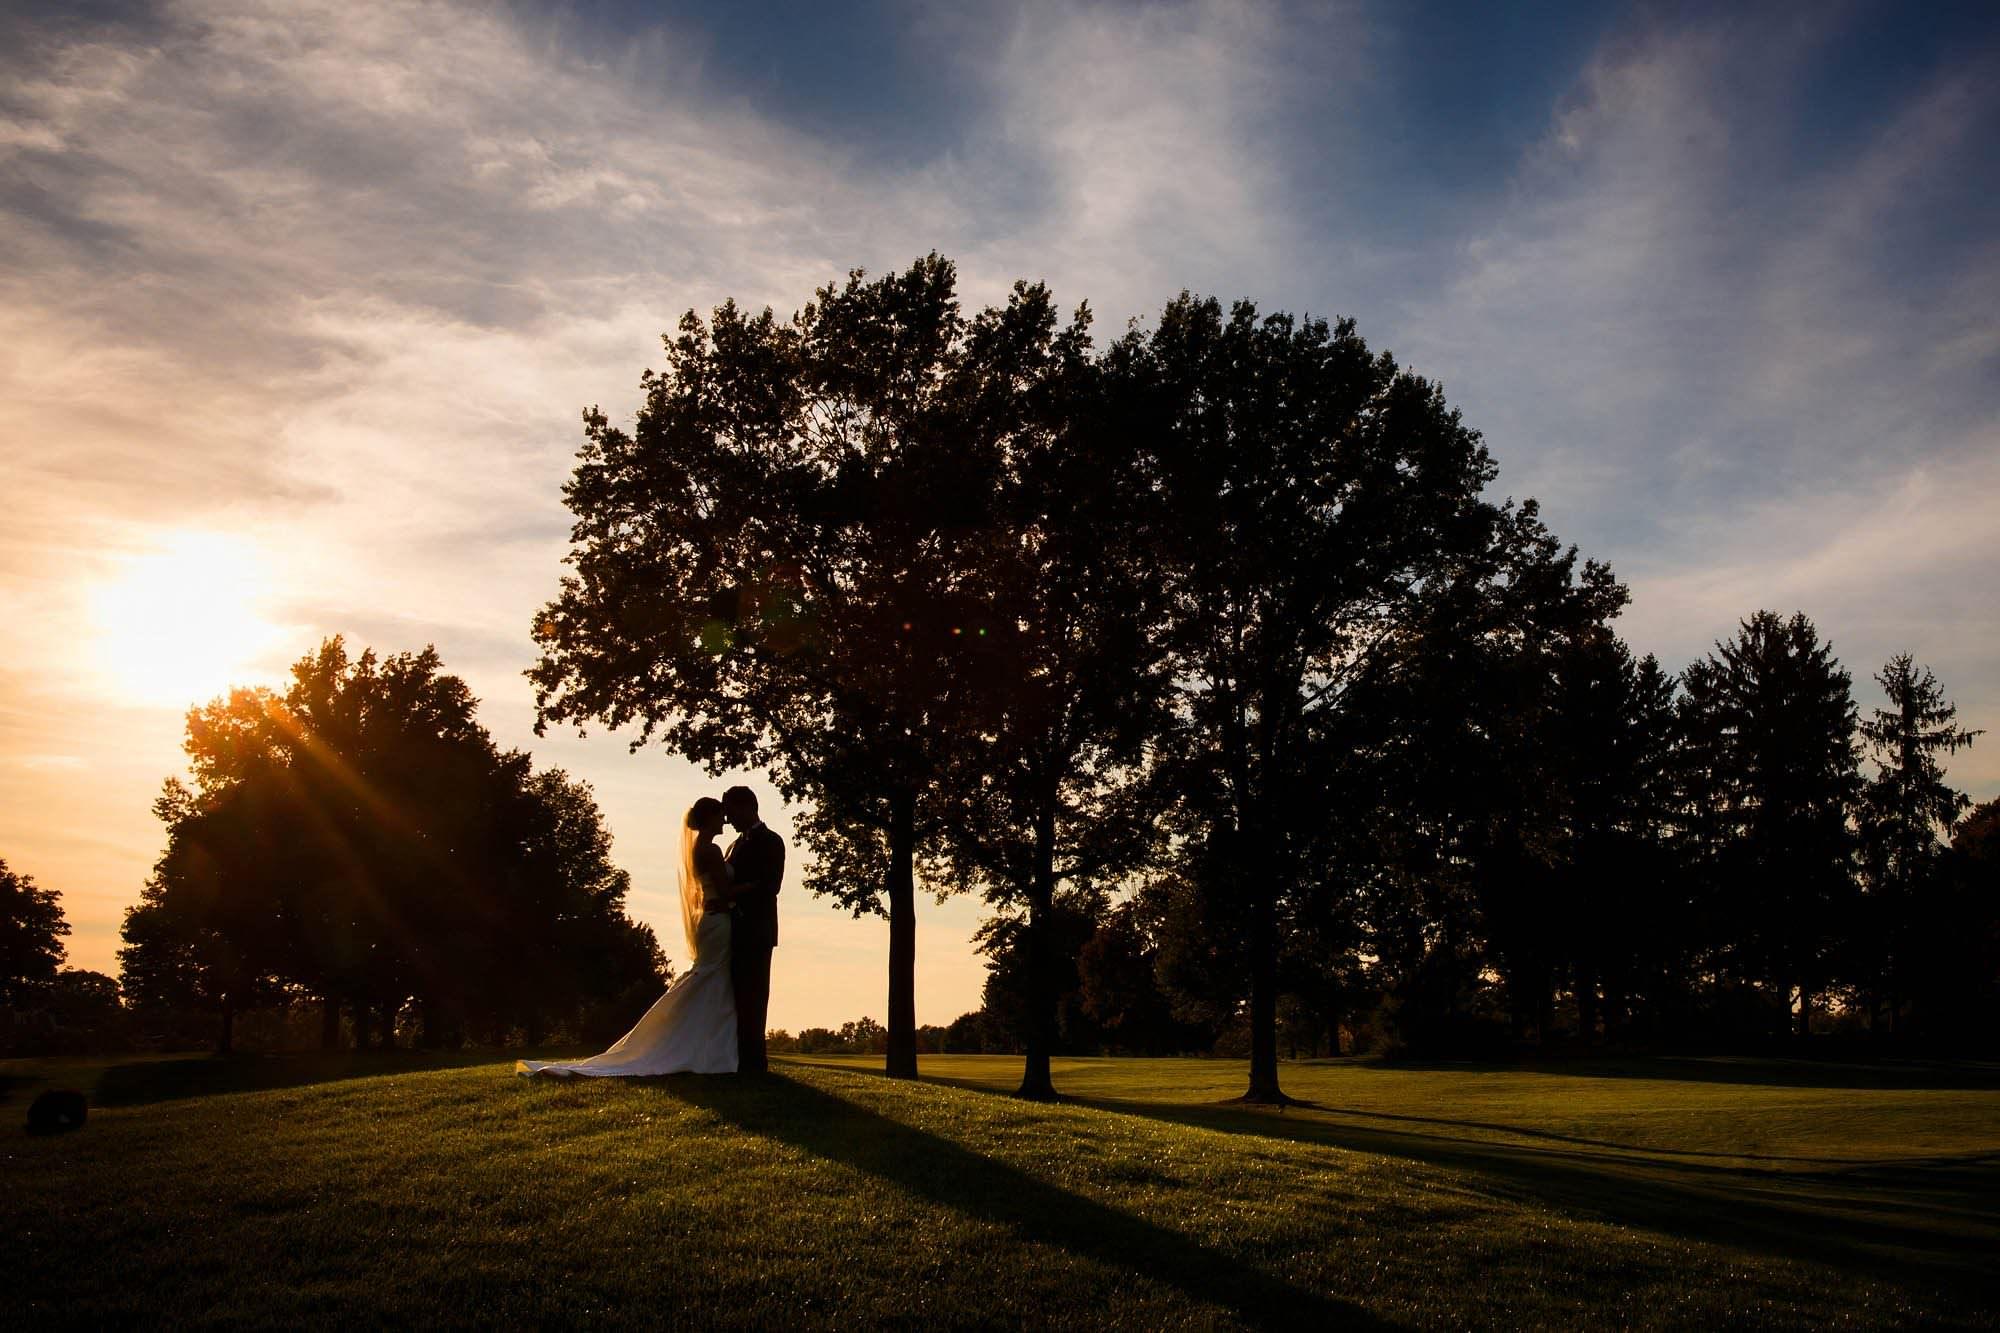 008-portage-country-club-akron-ohio-wedding-photographer-genevieve-nisly-photography